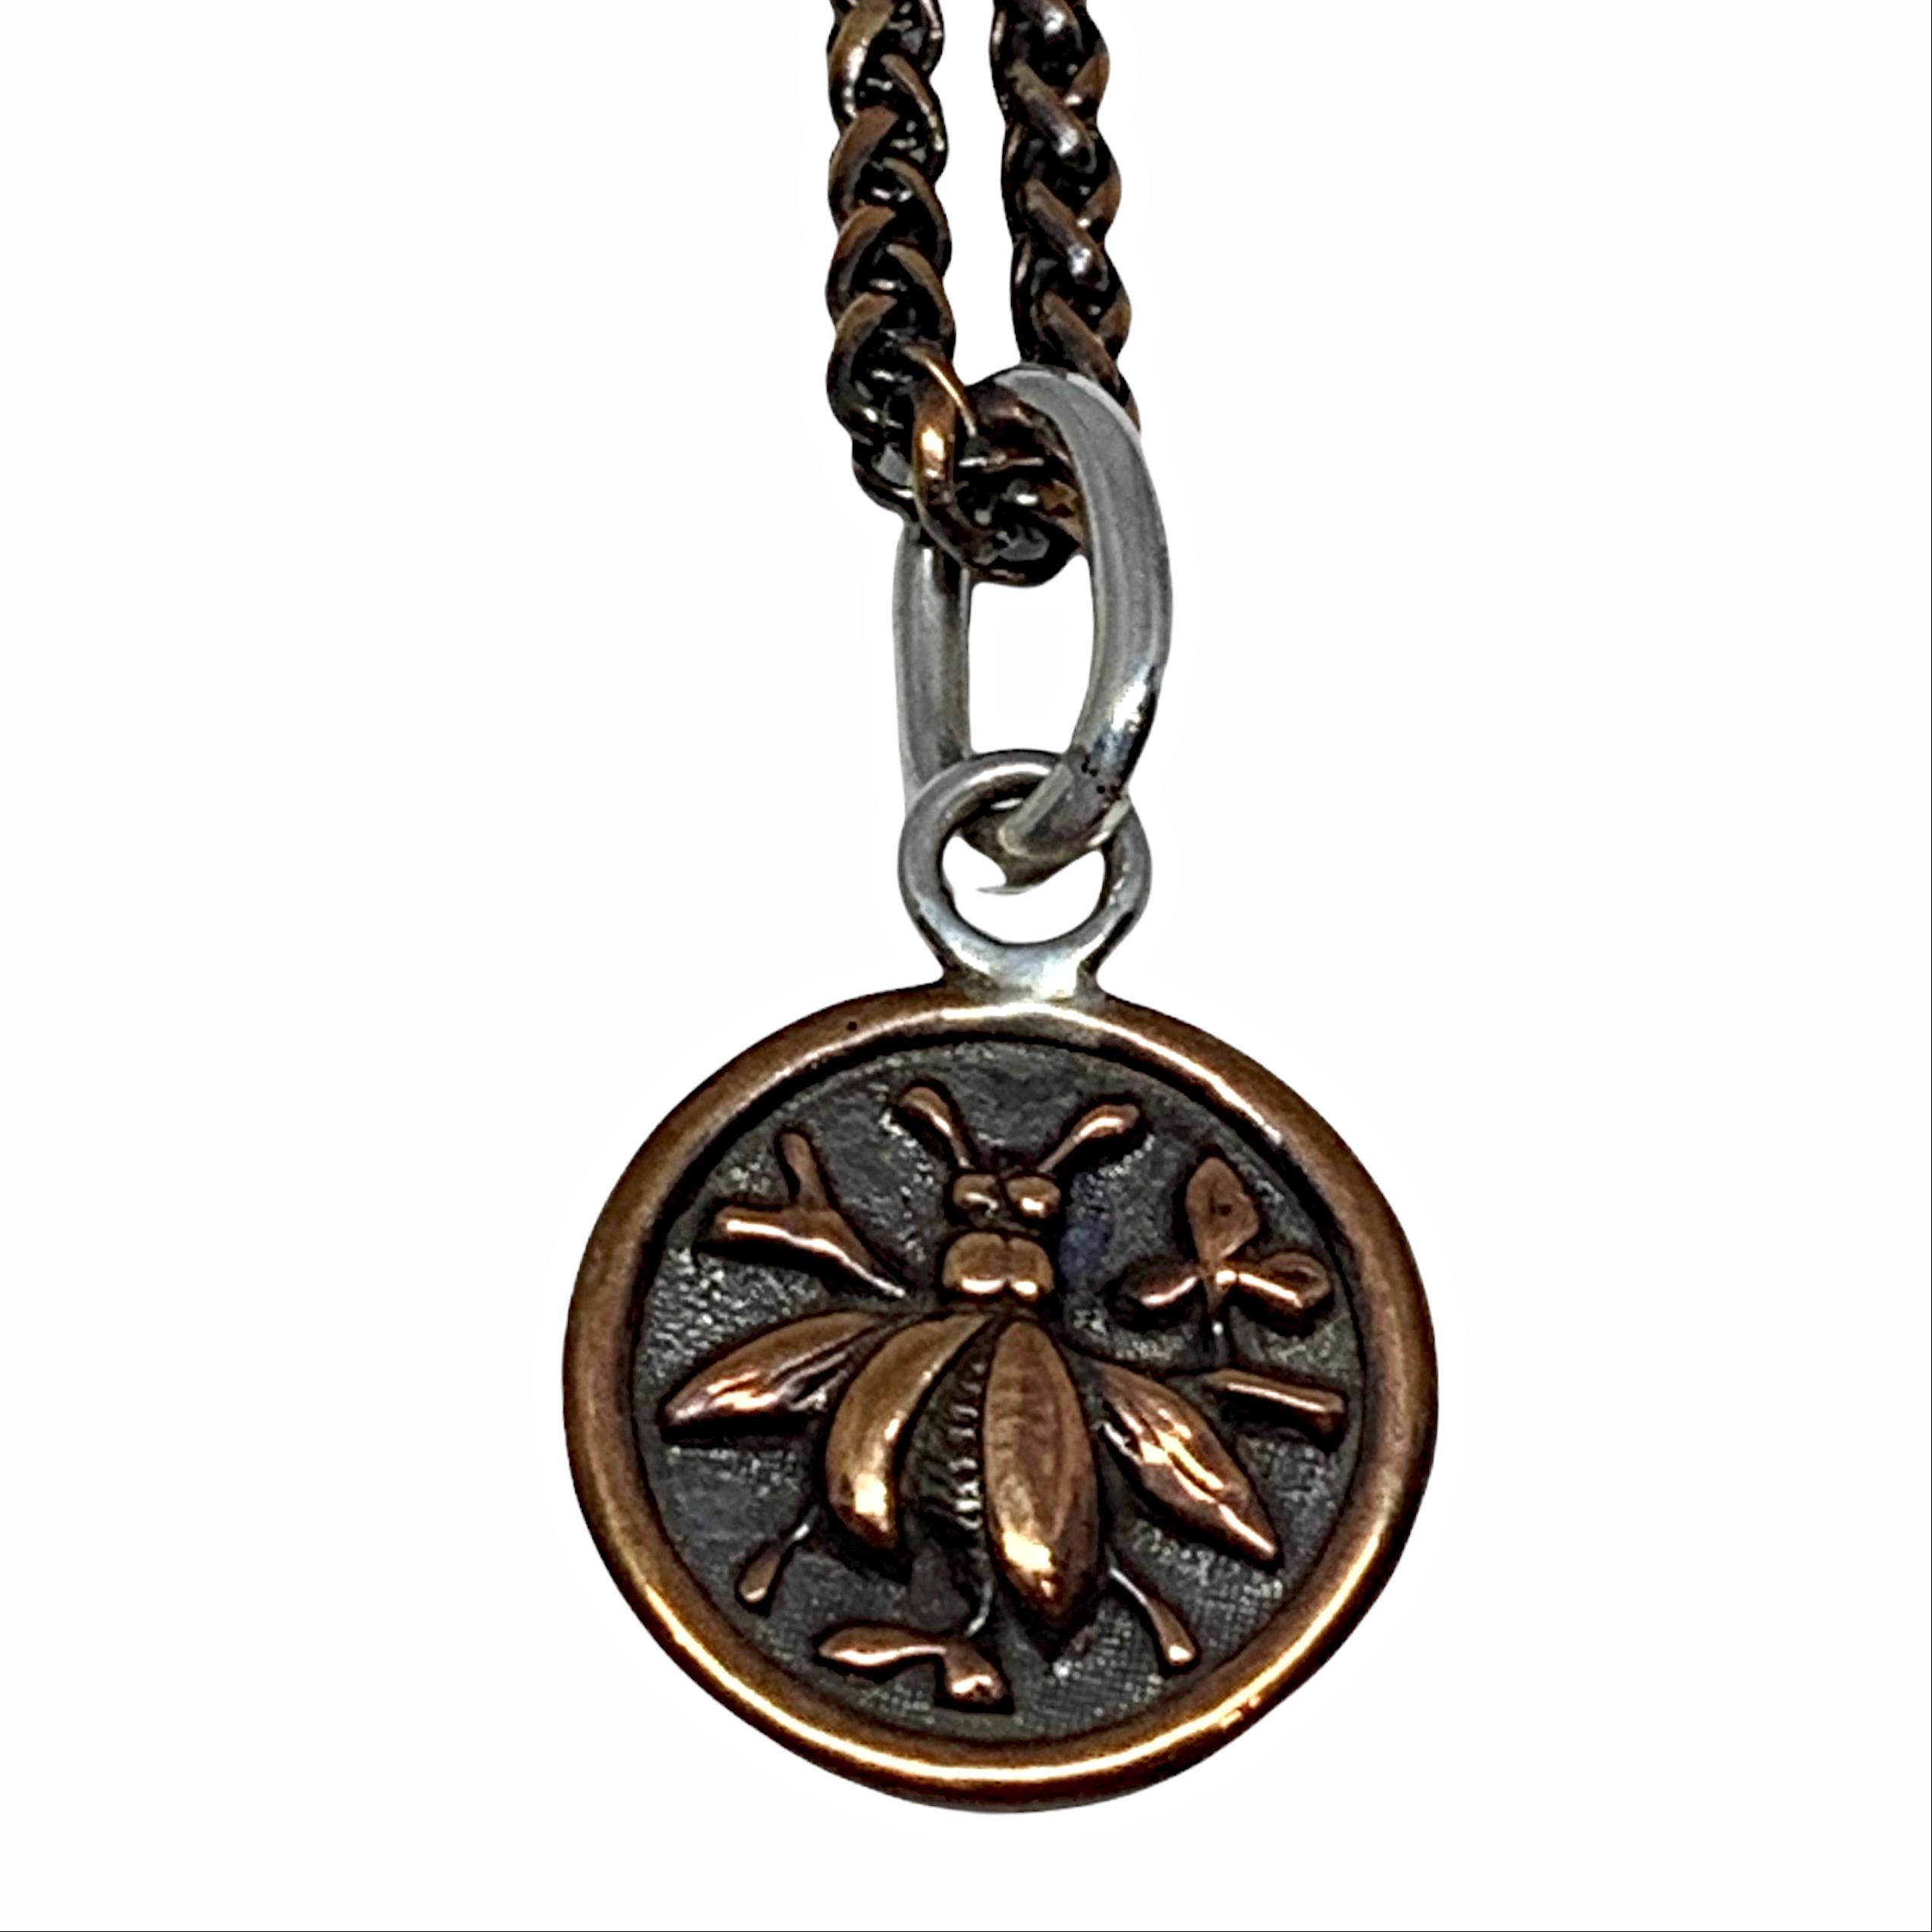 Handmade copper bee pendant by Karyn Chopik   Effusion Art Gallery + Cast Glass Studio, Invermere BC